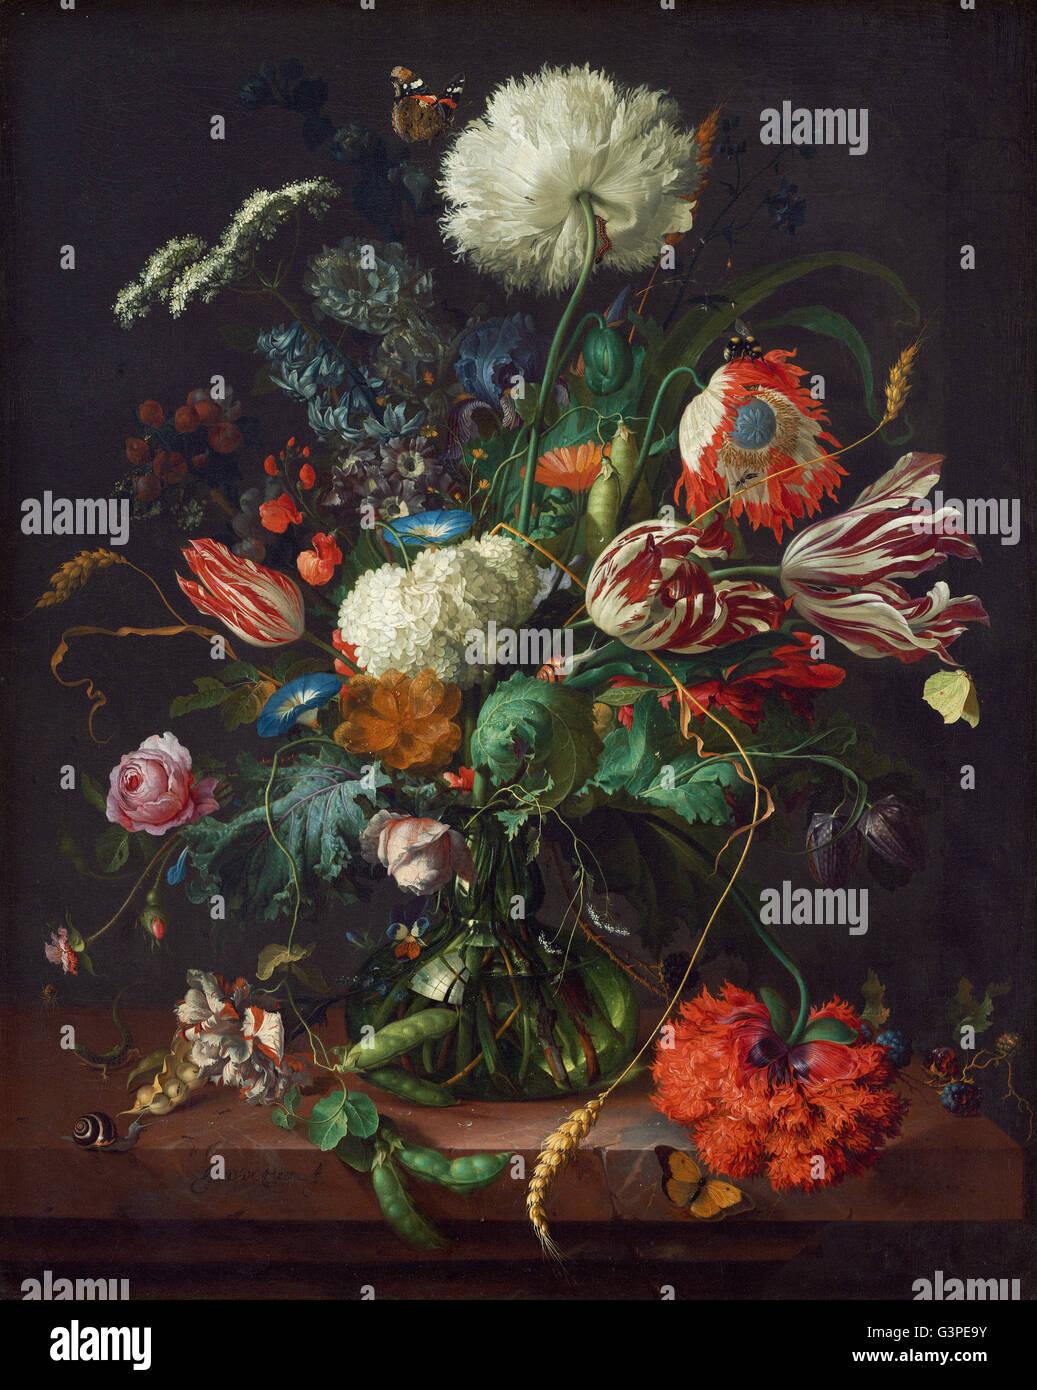 Jan Davidsz de Heem - Vaso di fiori - National Gallery of Art di Washington DC Foto Stock